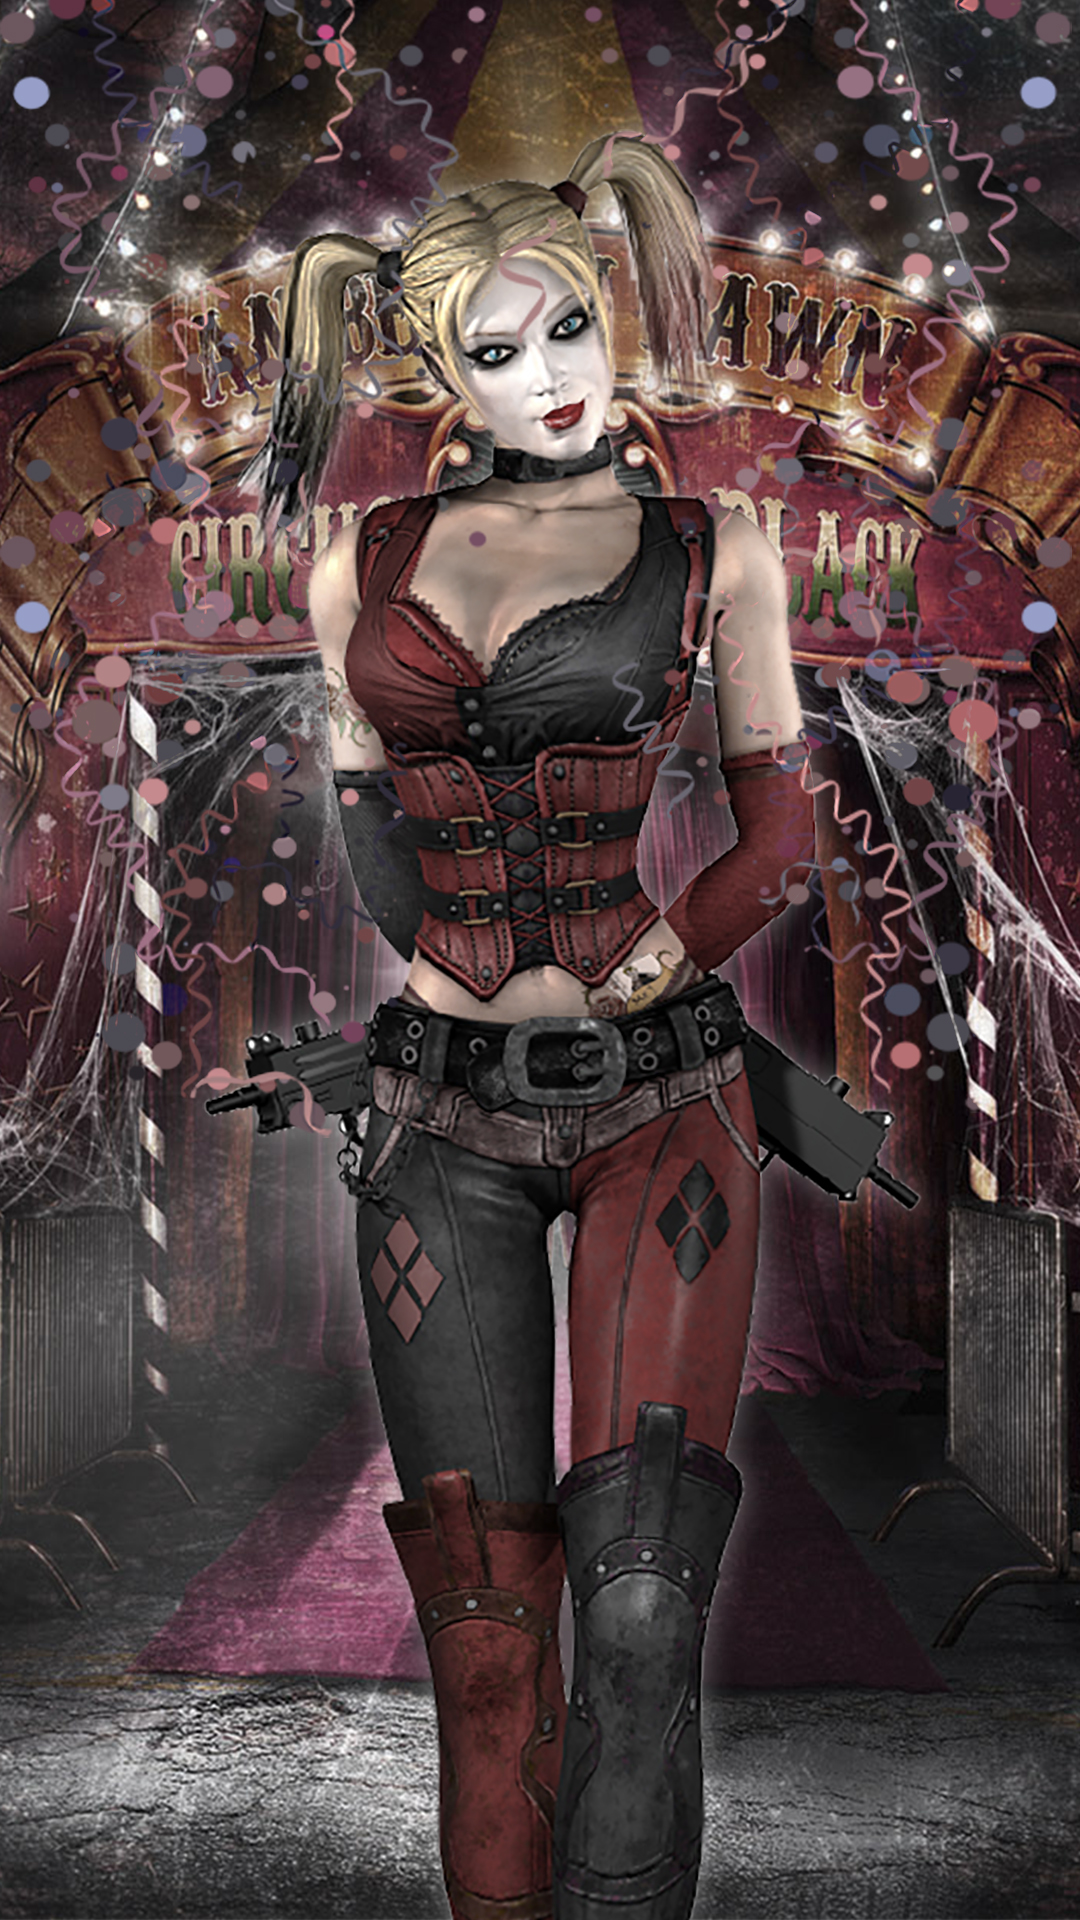 Harley Quinn Arkham City By Jpgraphic On Deviantart